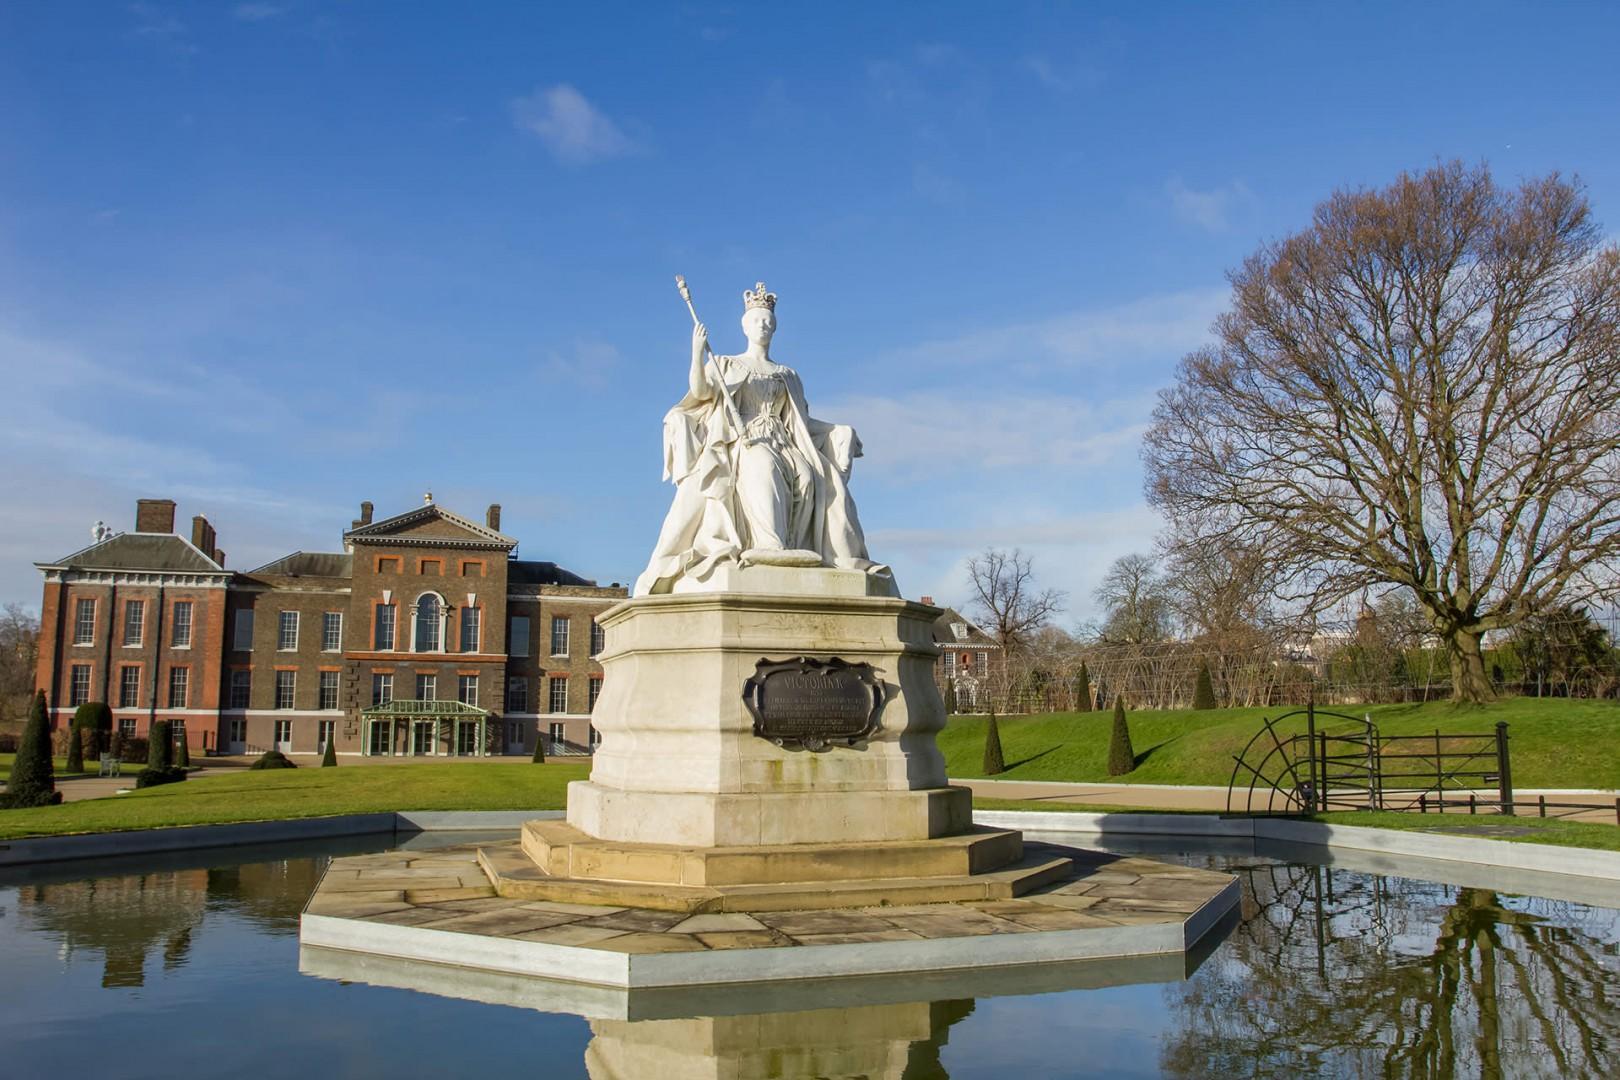 17-kensington-palace-fountain